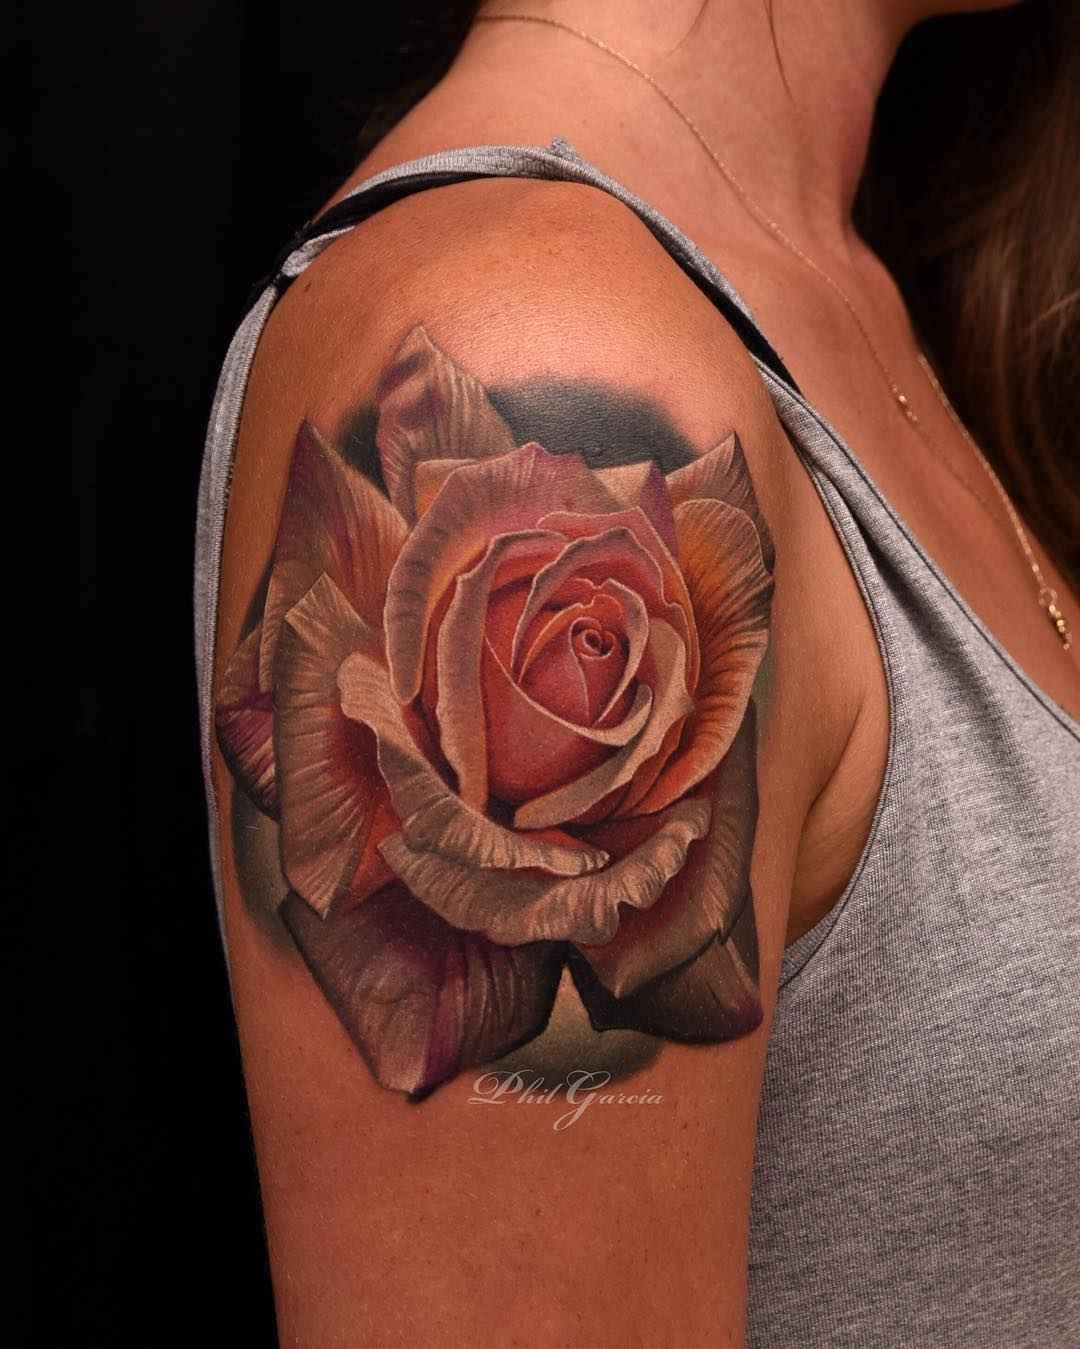 4960a740d realism rose tattoo artist Phil garcia   тату мастер Фил Гарсия реализм  татуировки розы